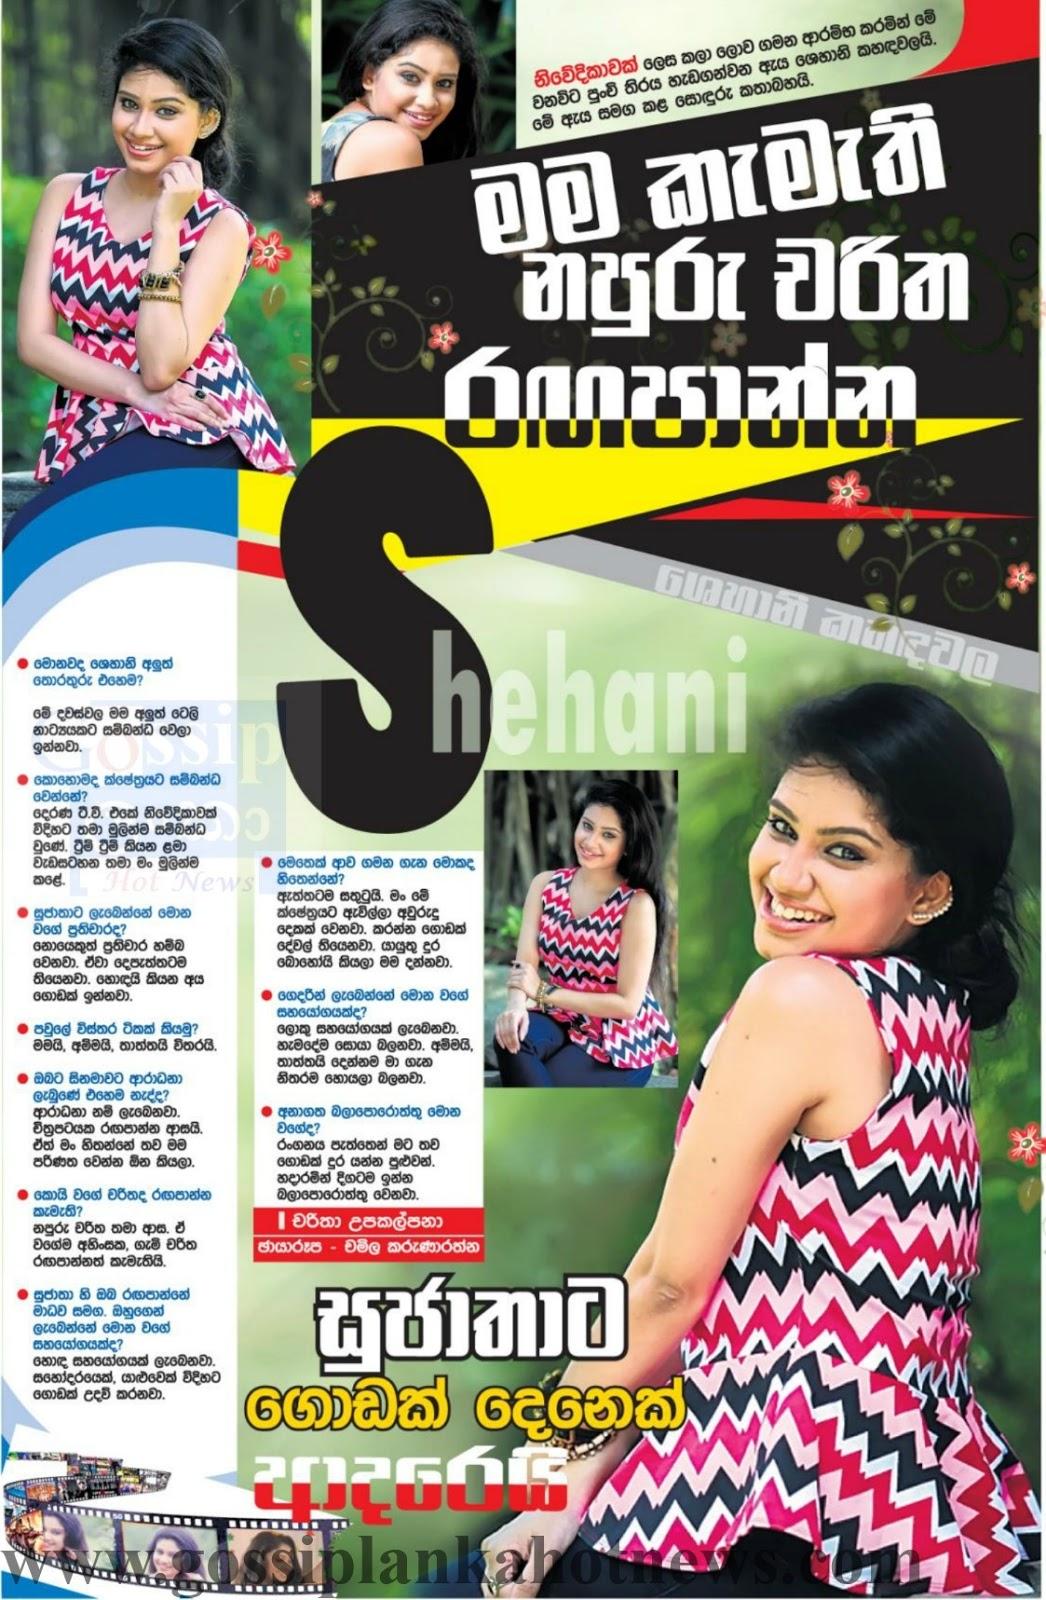 Shehani Kahandawala - Sujatha teledrama